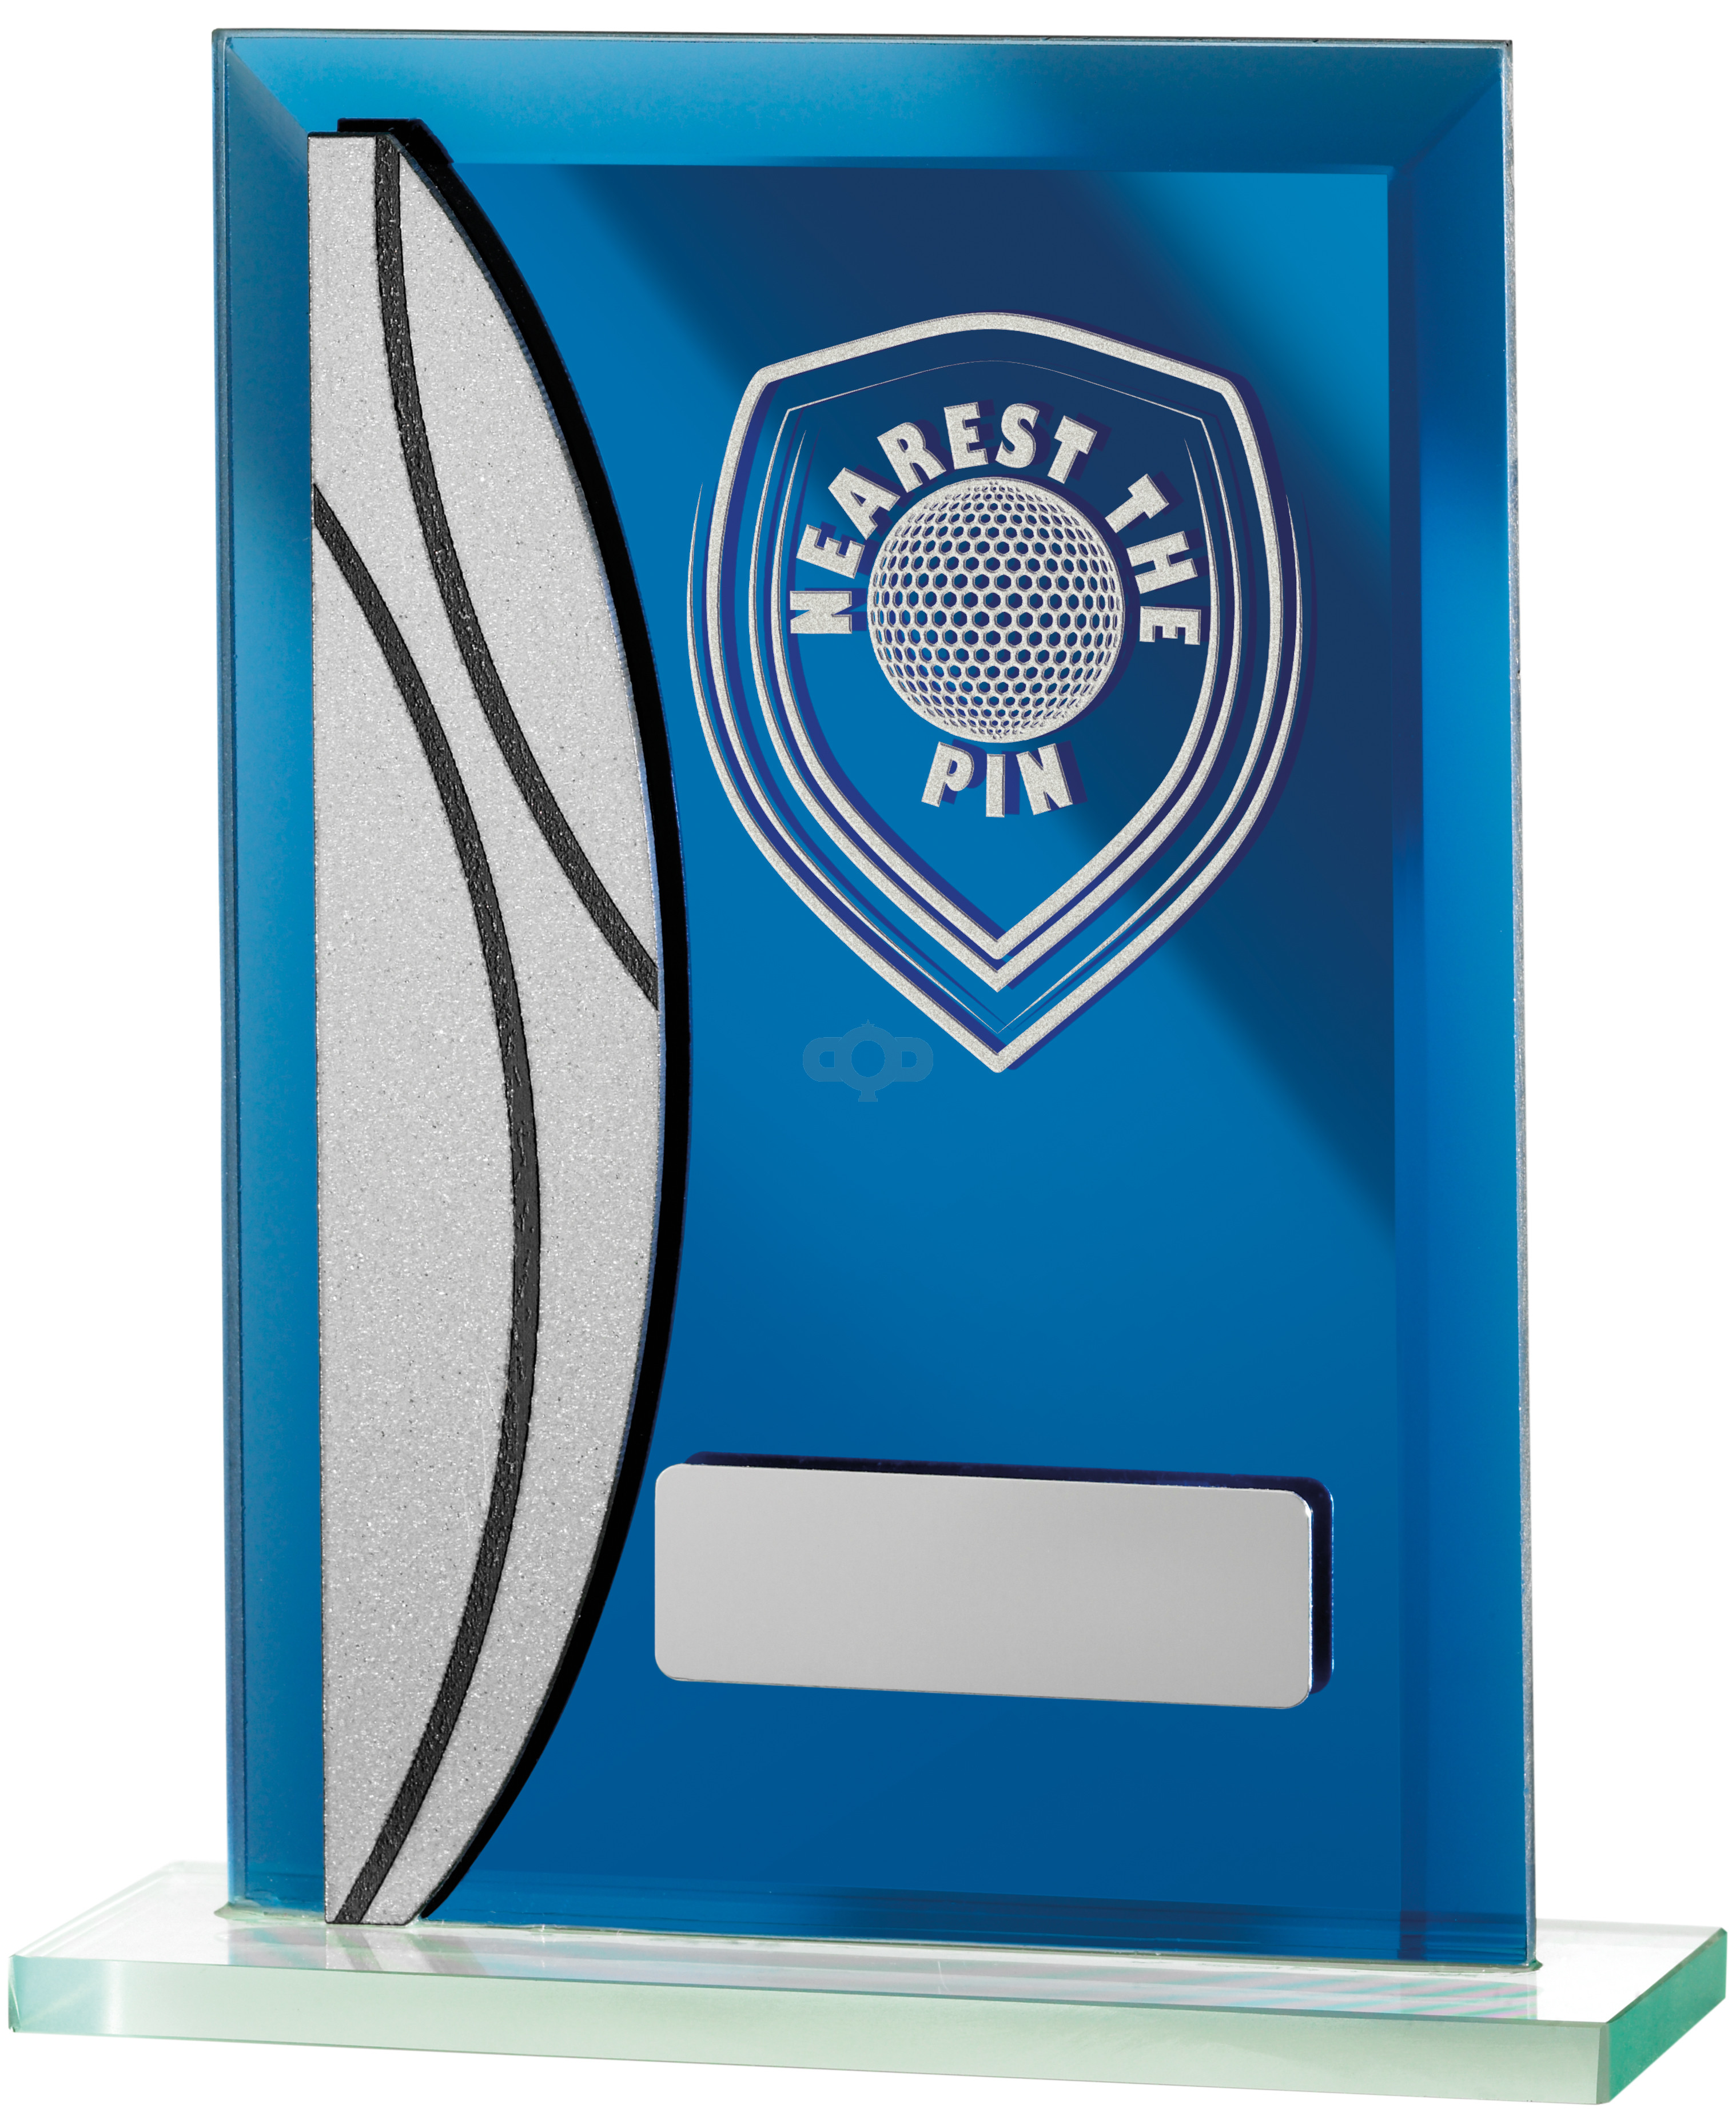 Golf Nearest The Pin Blue Mirrored Award